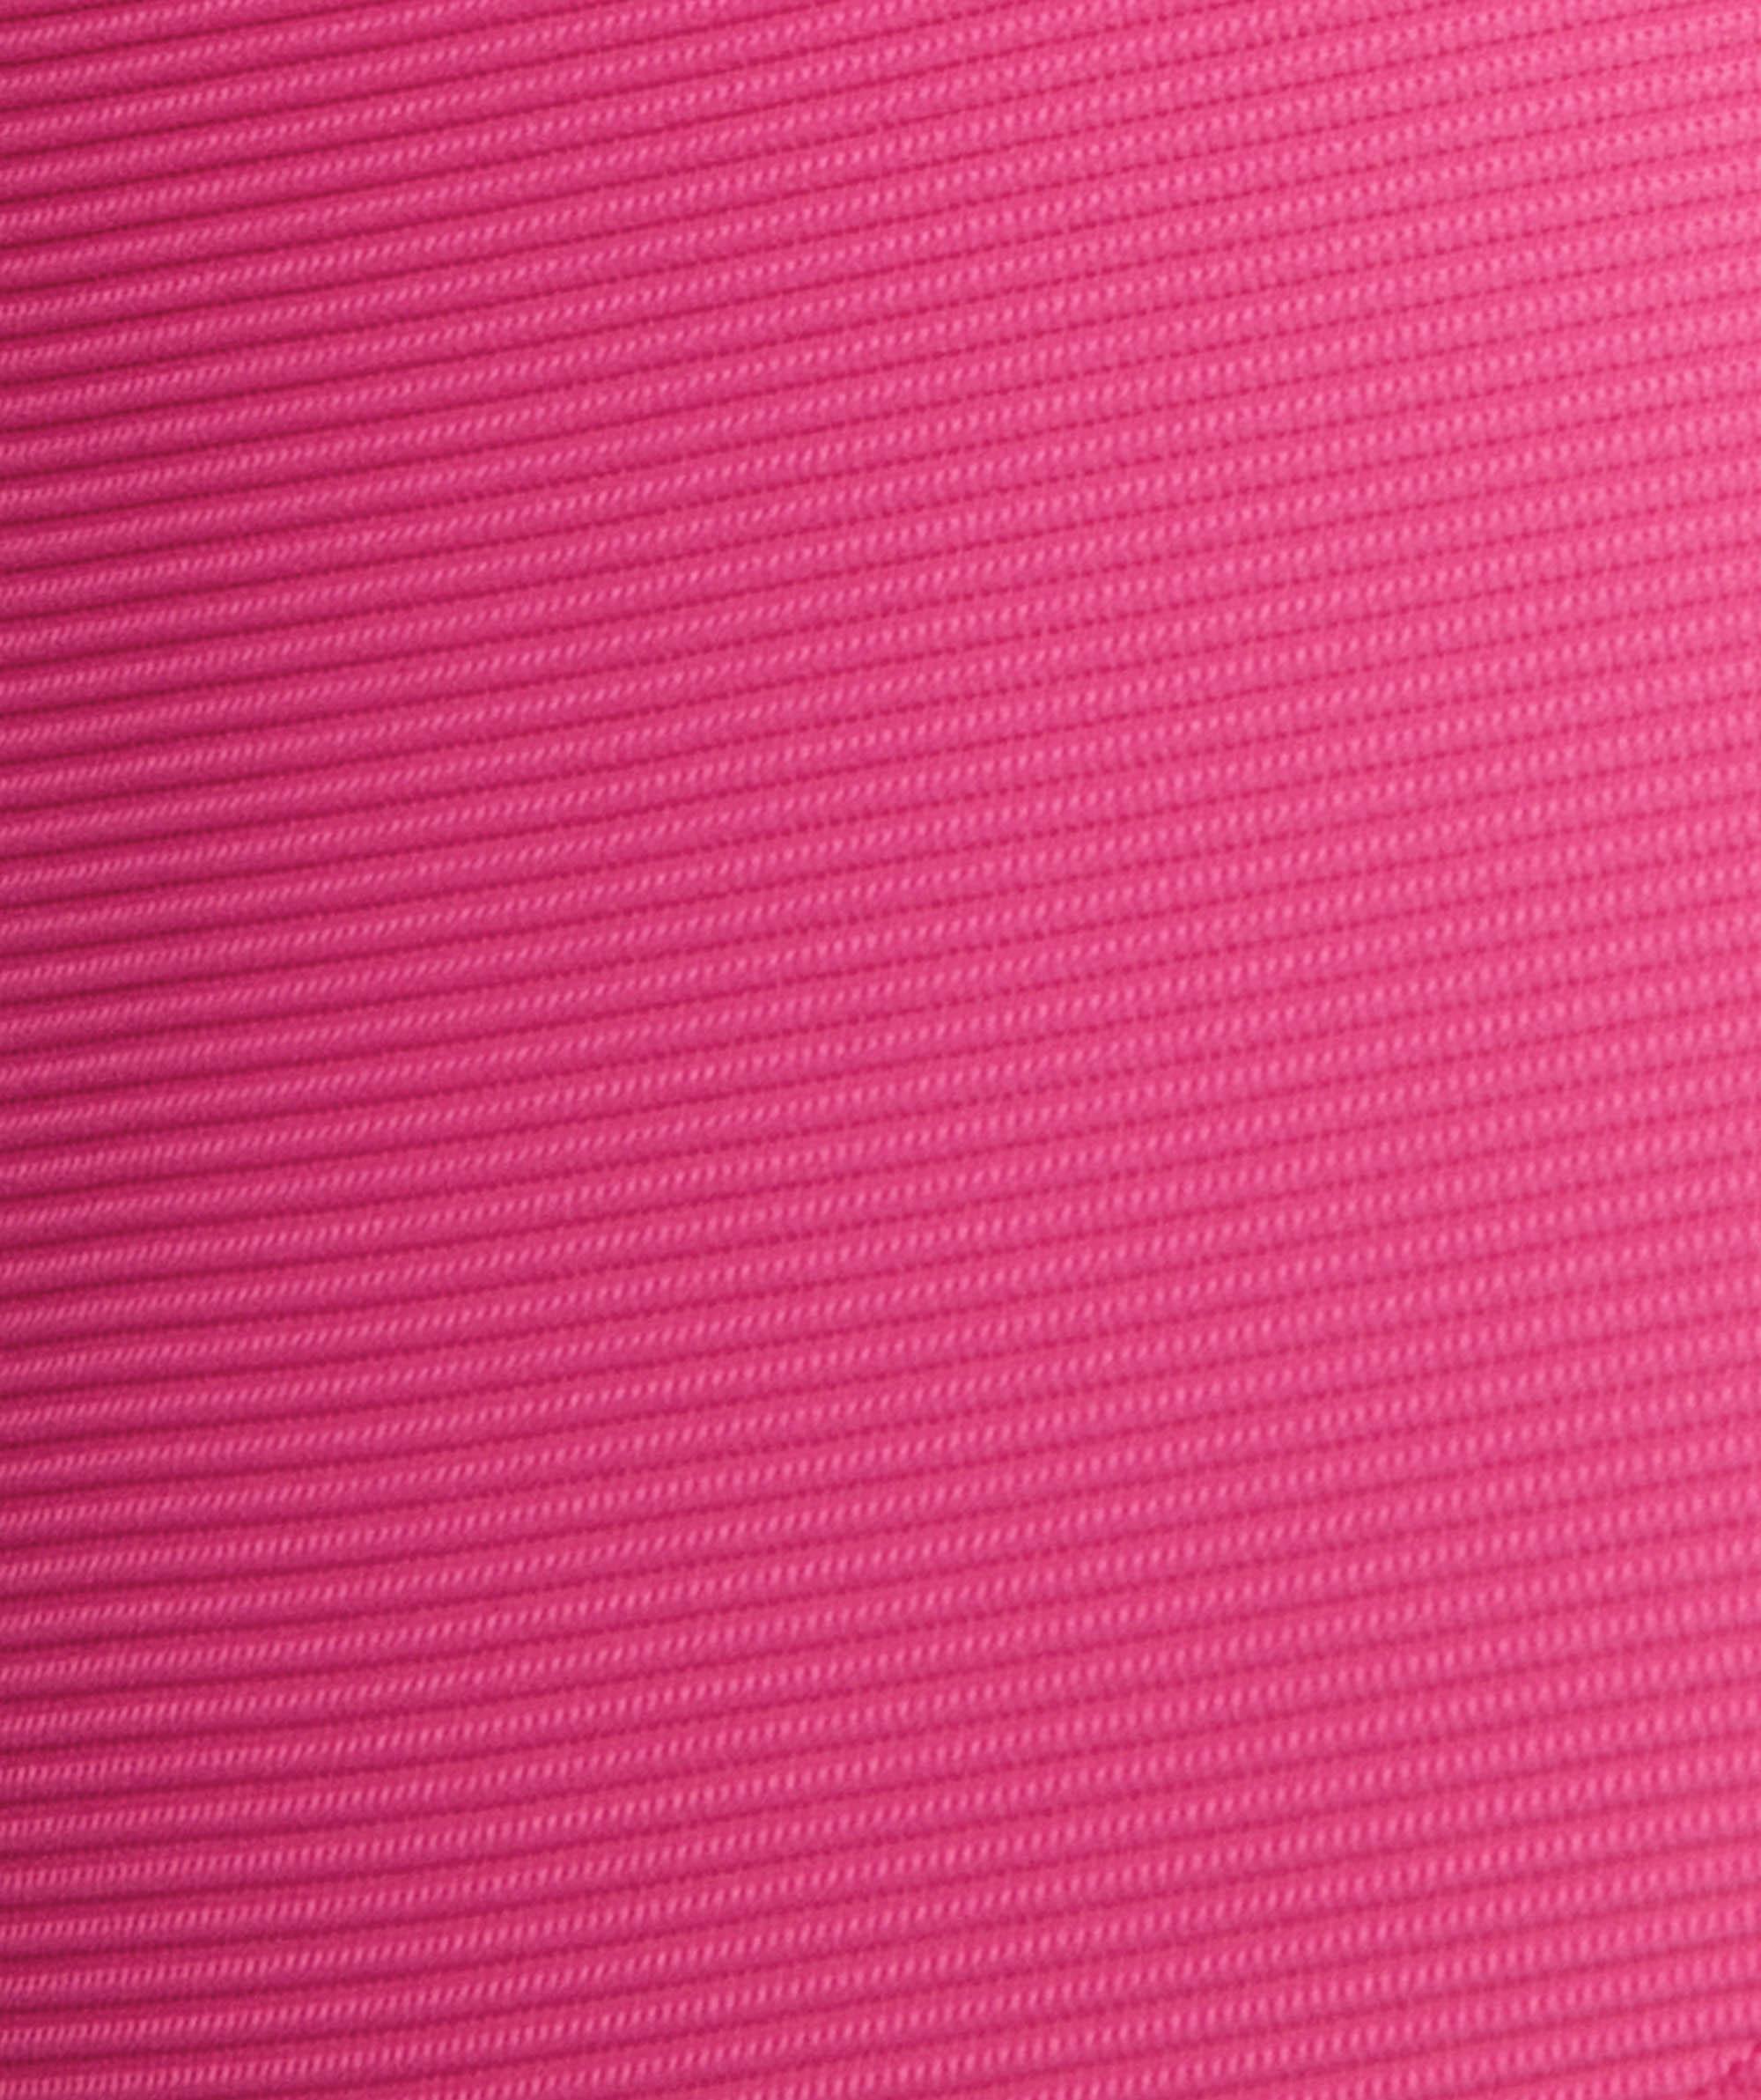 Vamp Tangier One Piece Swimsuit- Fuchsia Pink